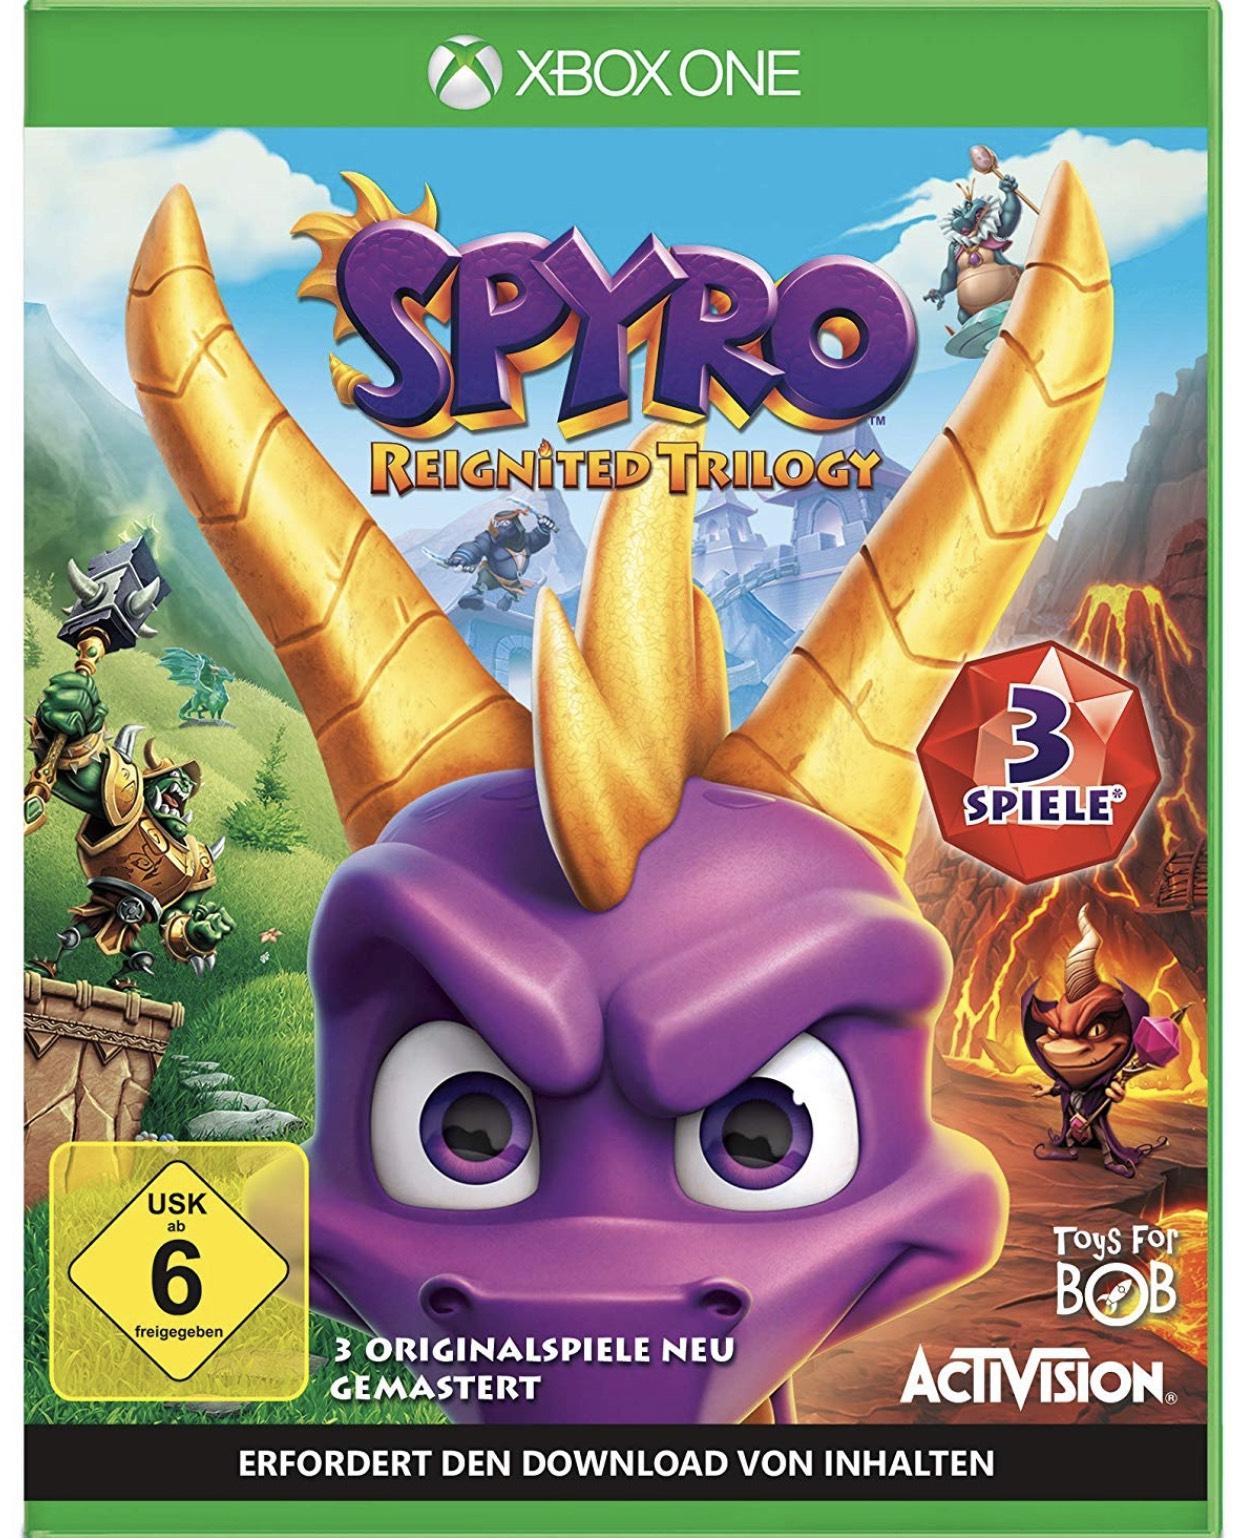 Spyro Reignited Trilogy für Xbox One